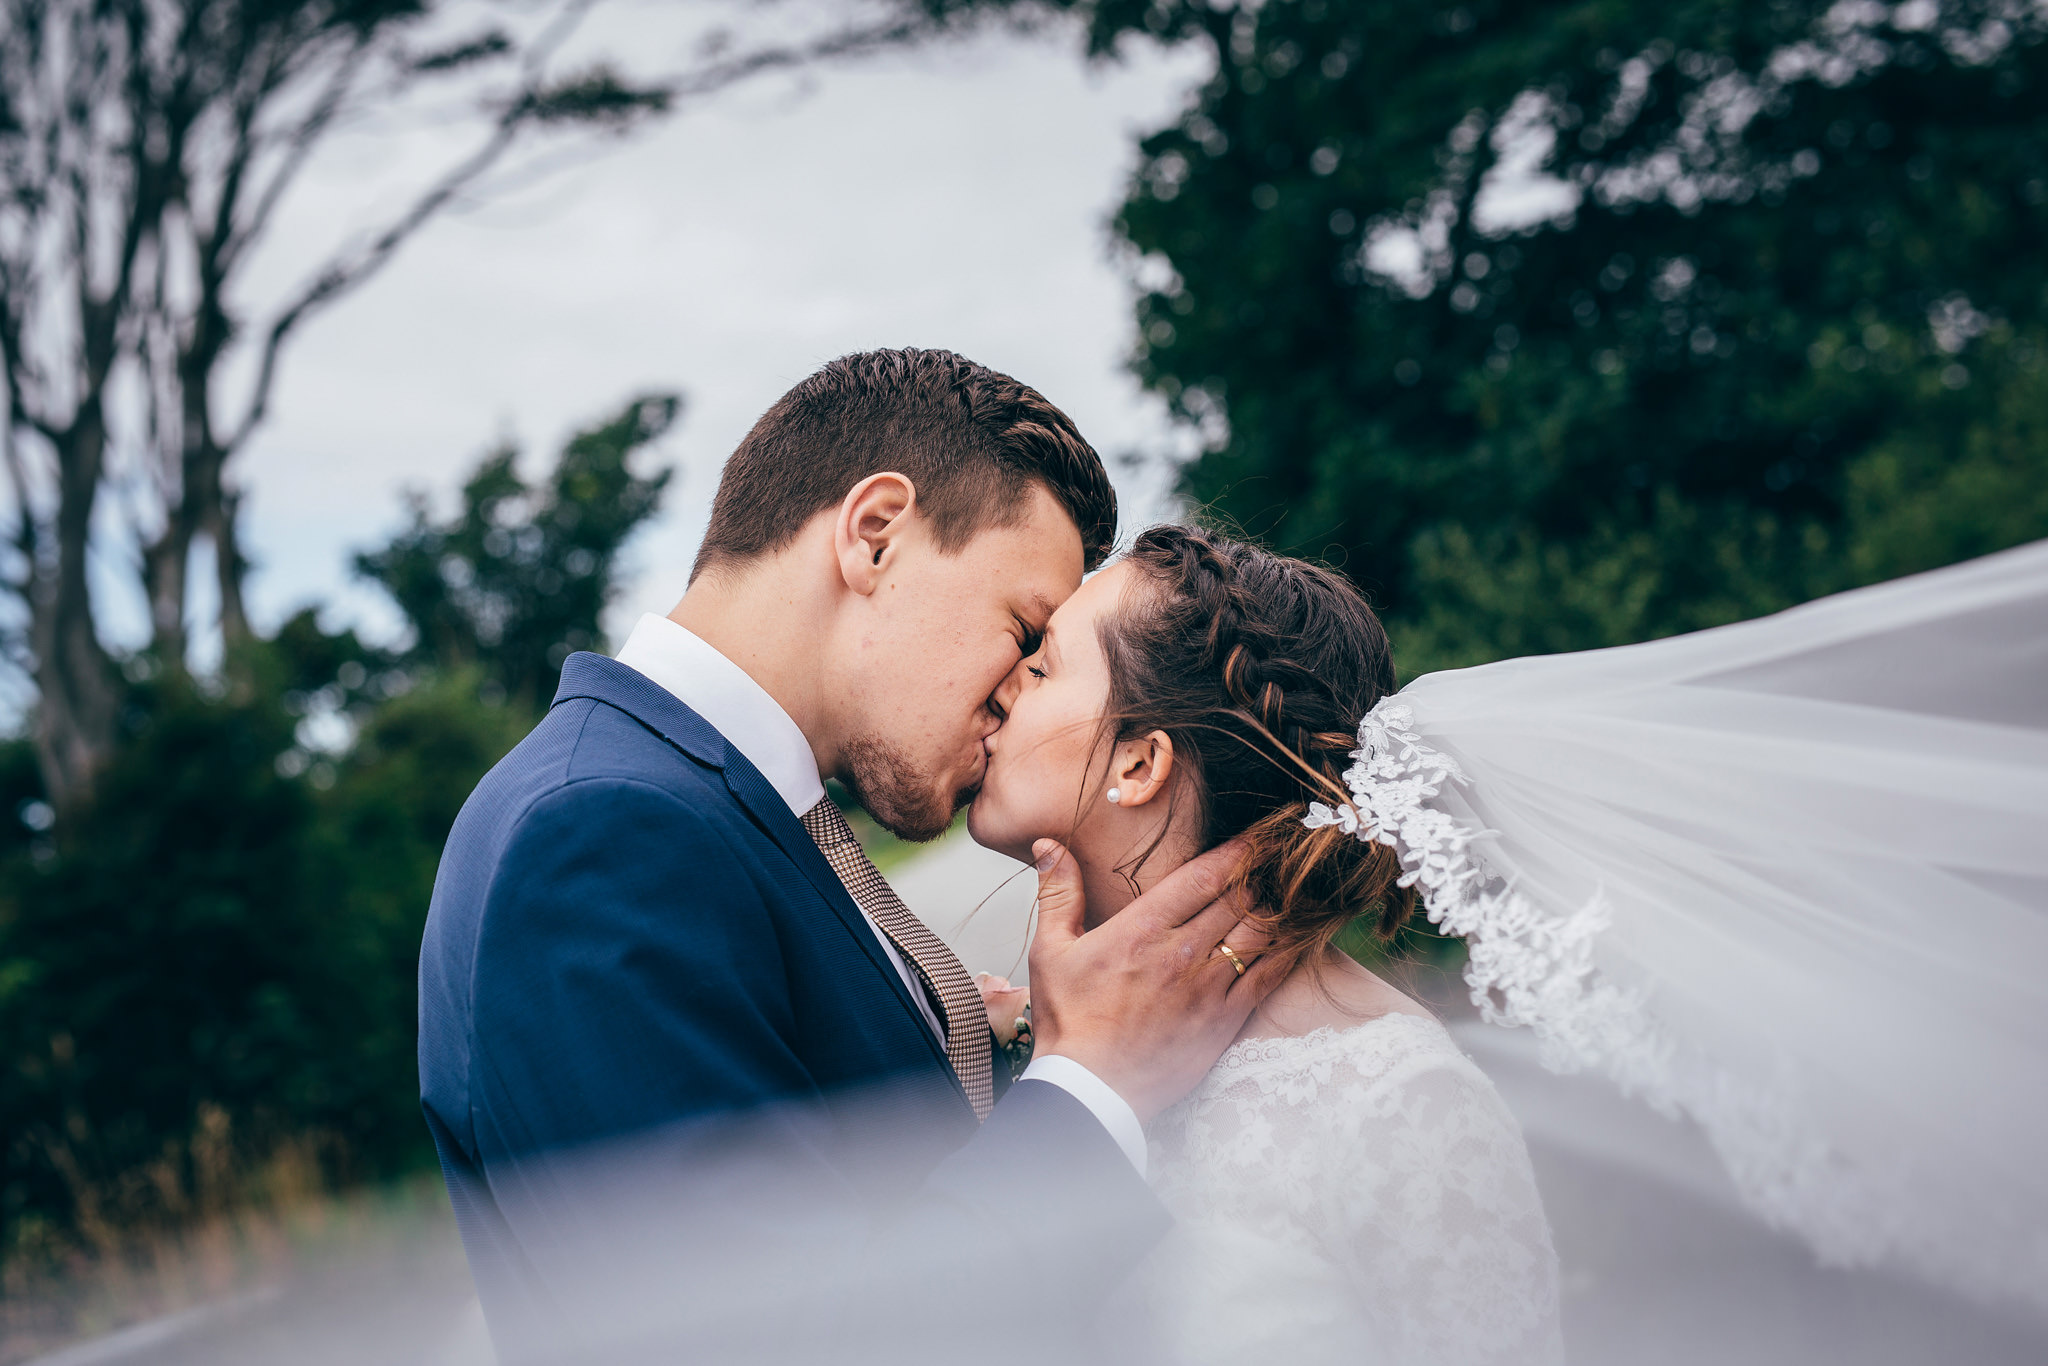 Norway+wedding+photographer+elopement+pre+wedding+Casey+Arneson-73.jpg